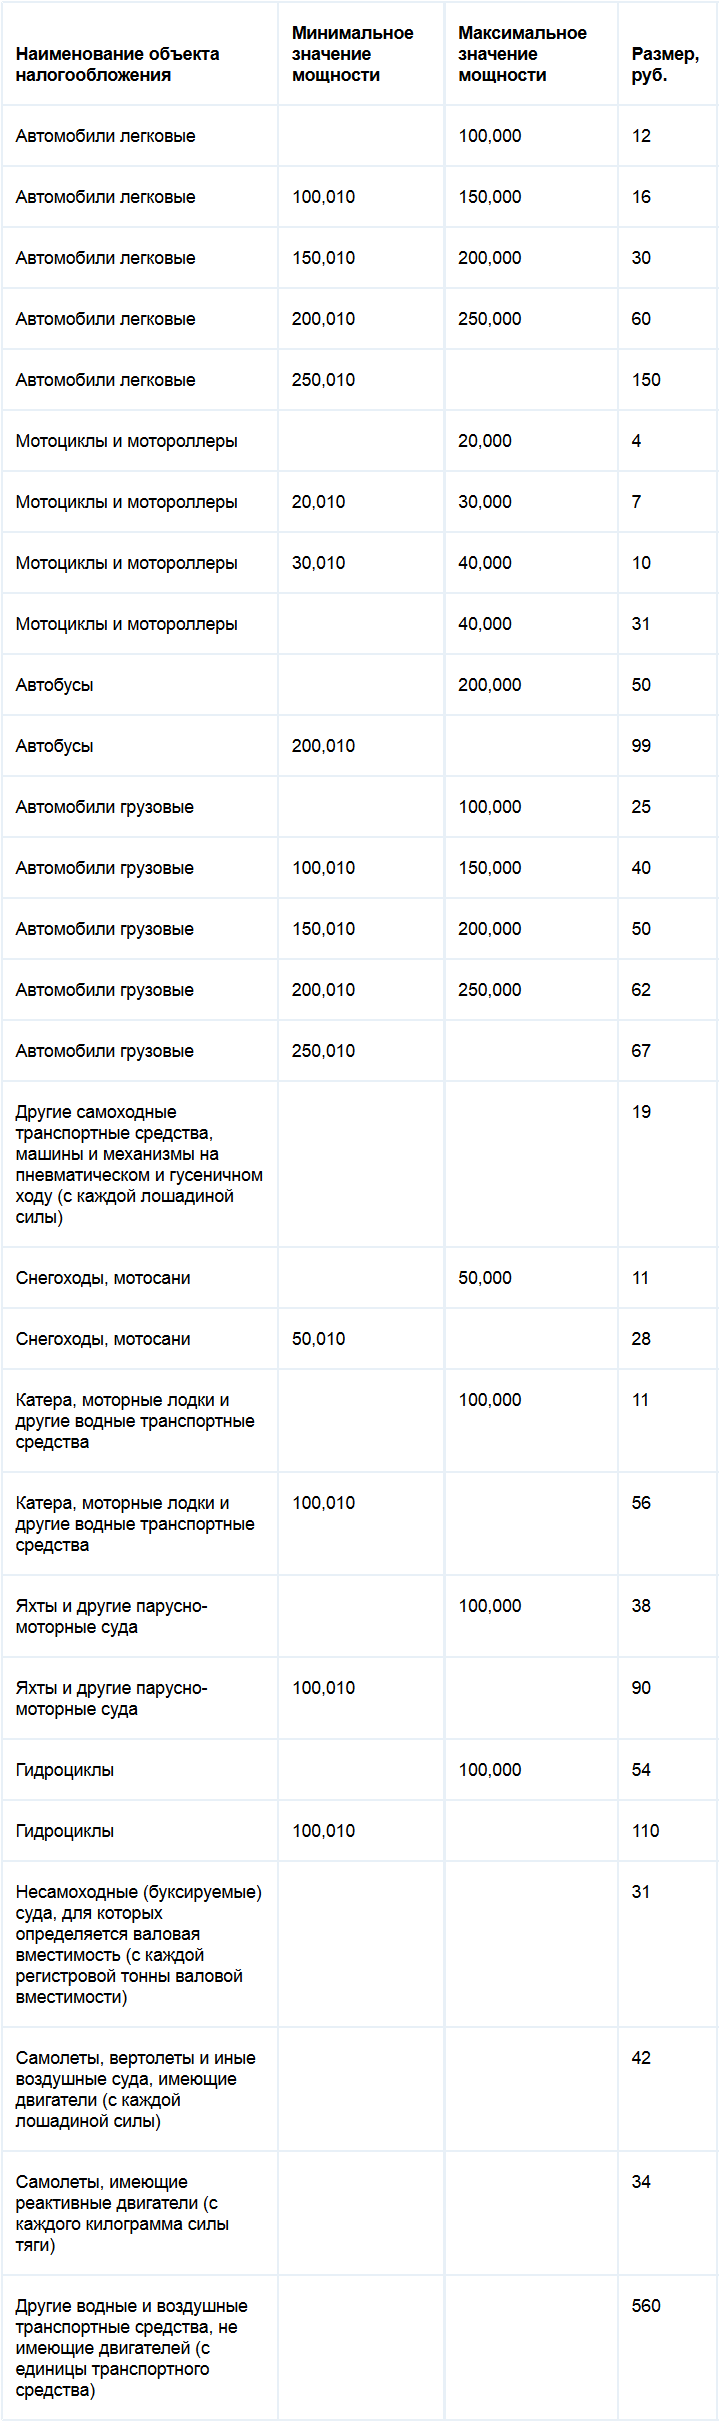 Ставки транспортного налога Хабаровского края